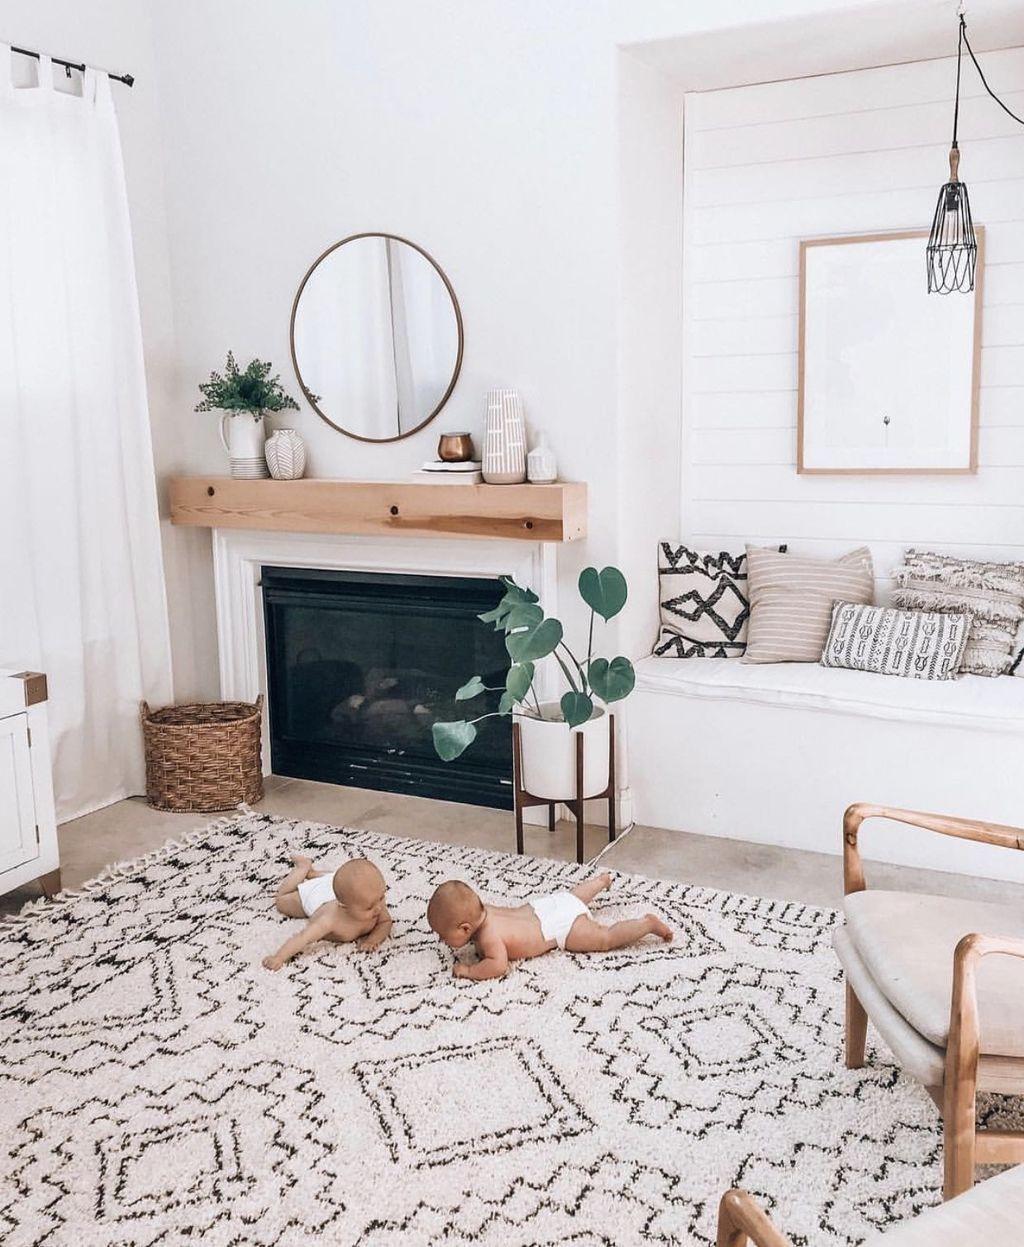 33 Stunning Bohemian Living Room Design Ideas images